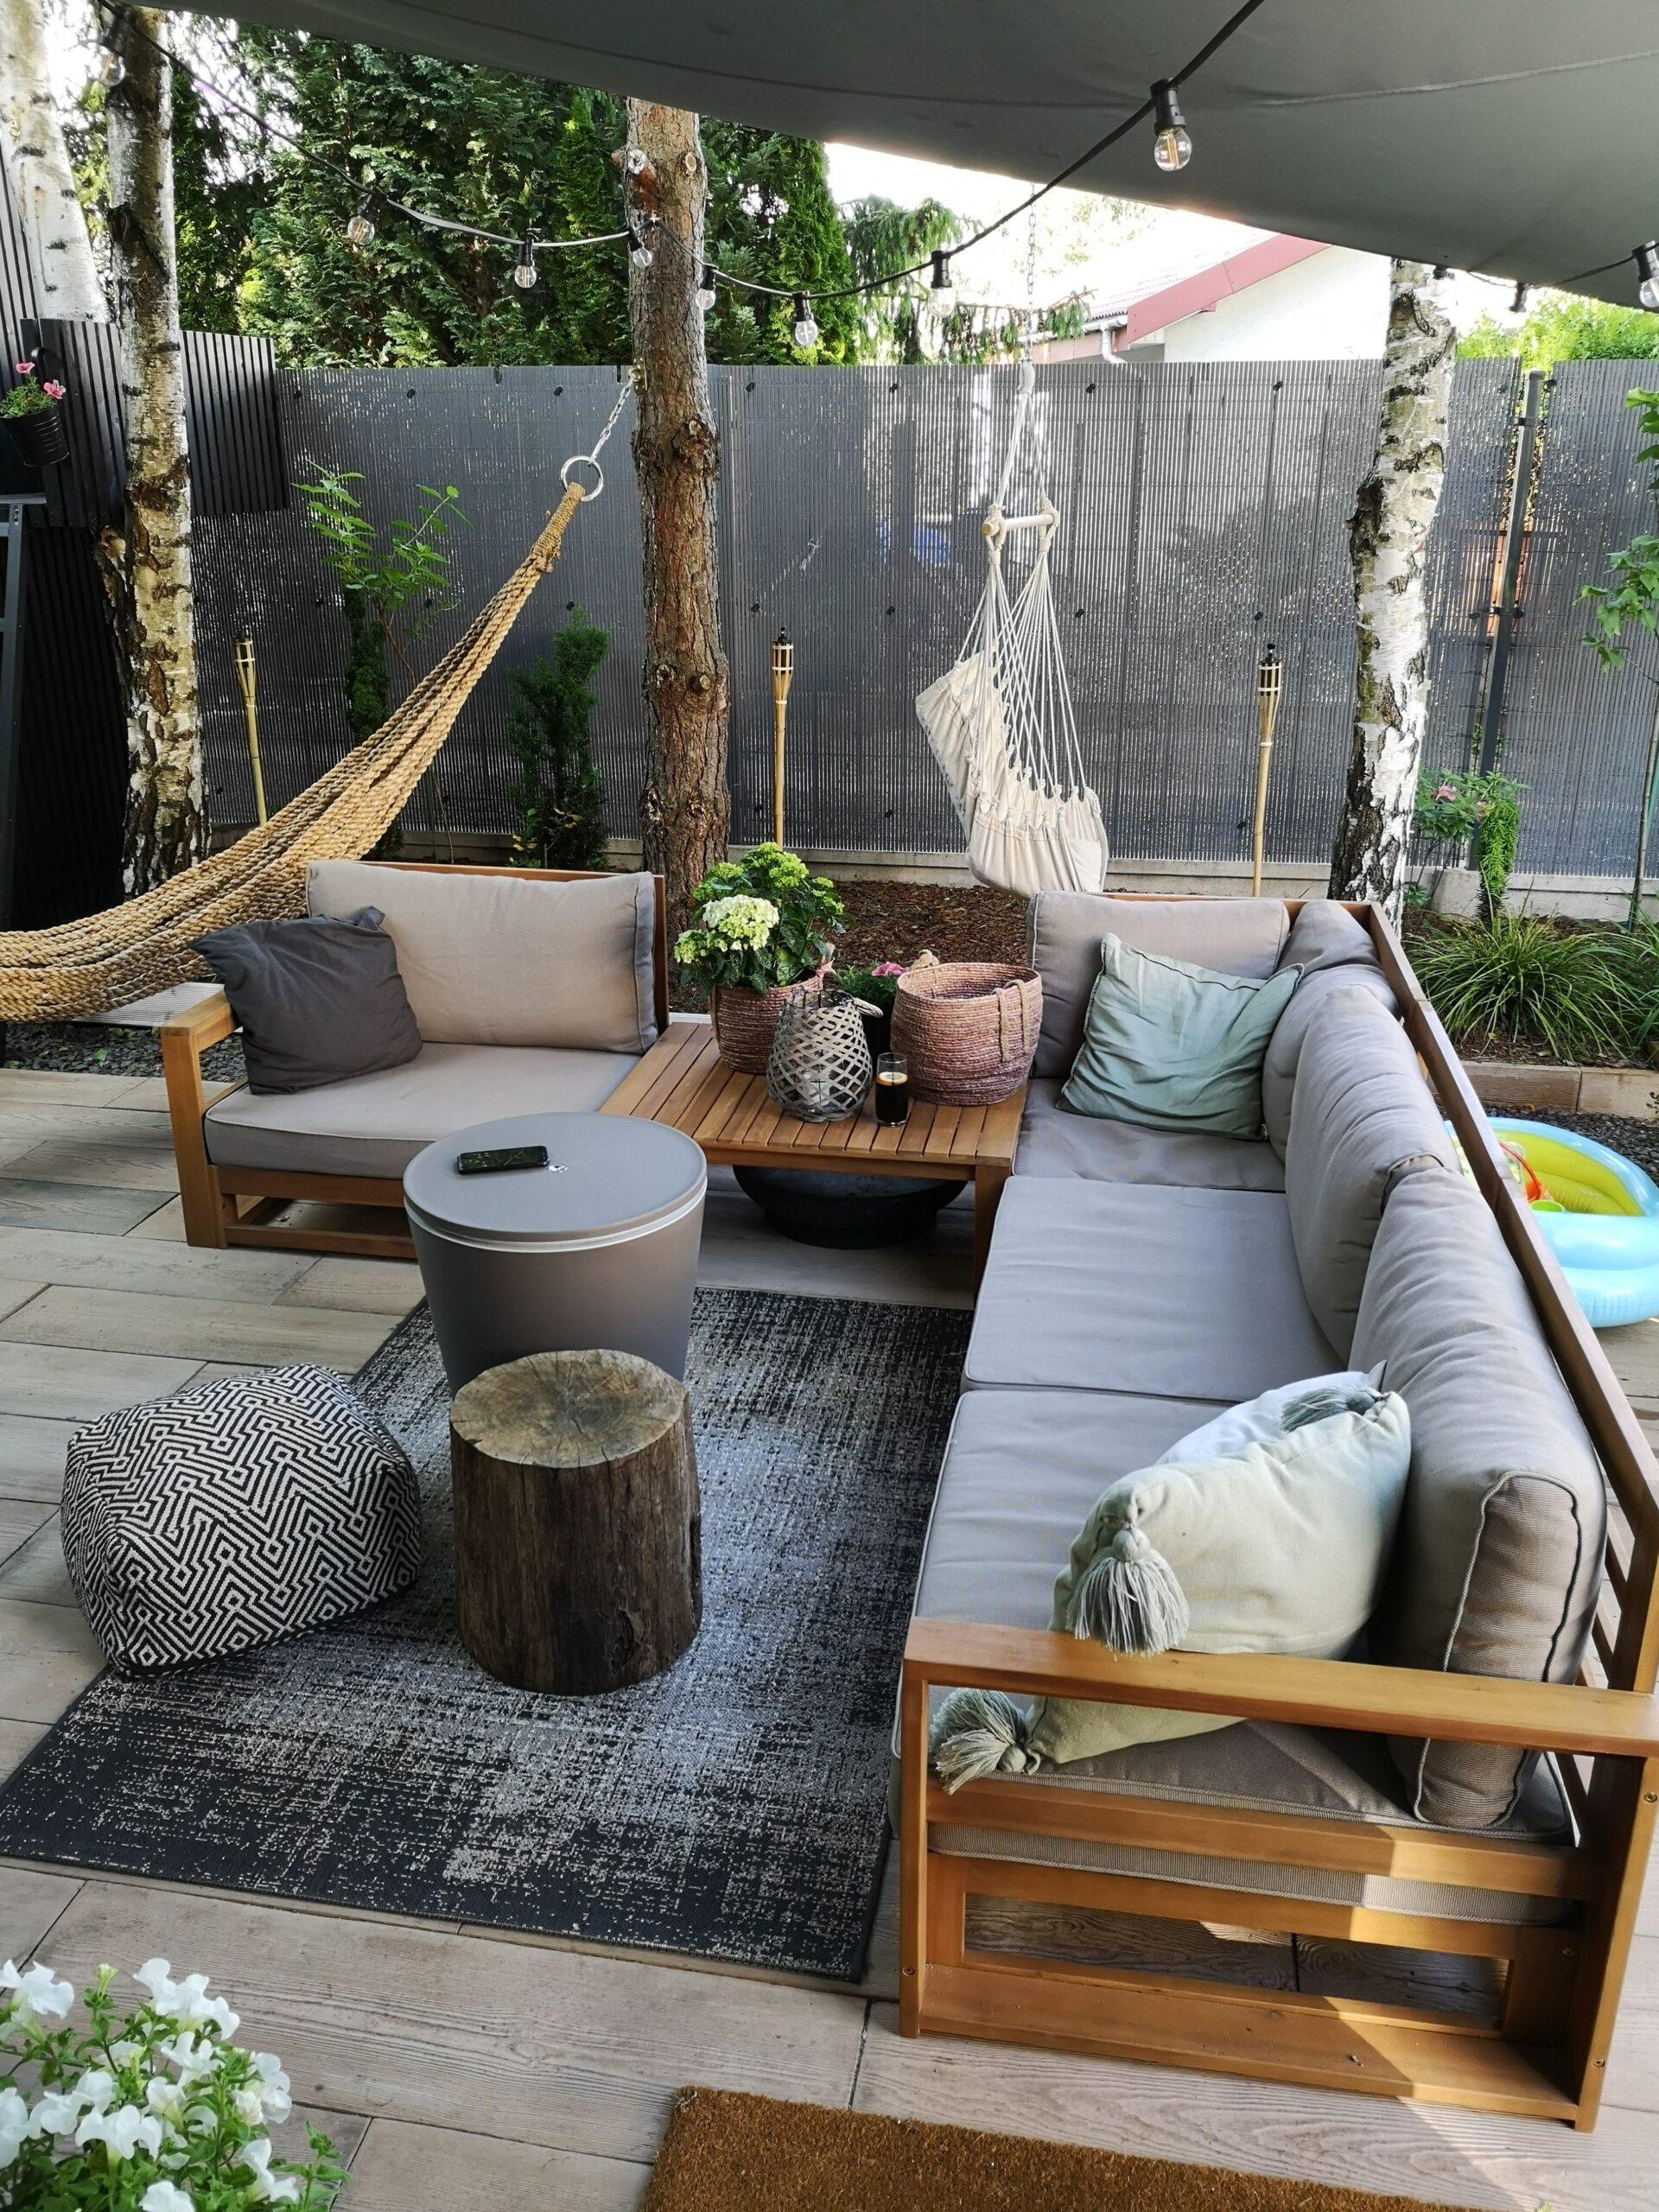 Full Size of Garten Lounge Set Klein Zertifiziertes Holz Timor In 2020 Pavillon Feuerstelle Im Möbel Dusche Komplett Sitzgruppe Bad Komplettset Loungemöbel Trennwand Wohnzimmer Garten Lounge Set Klein